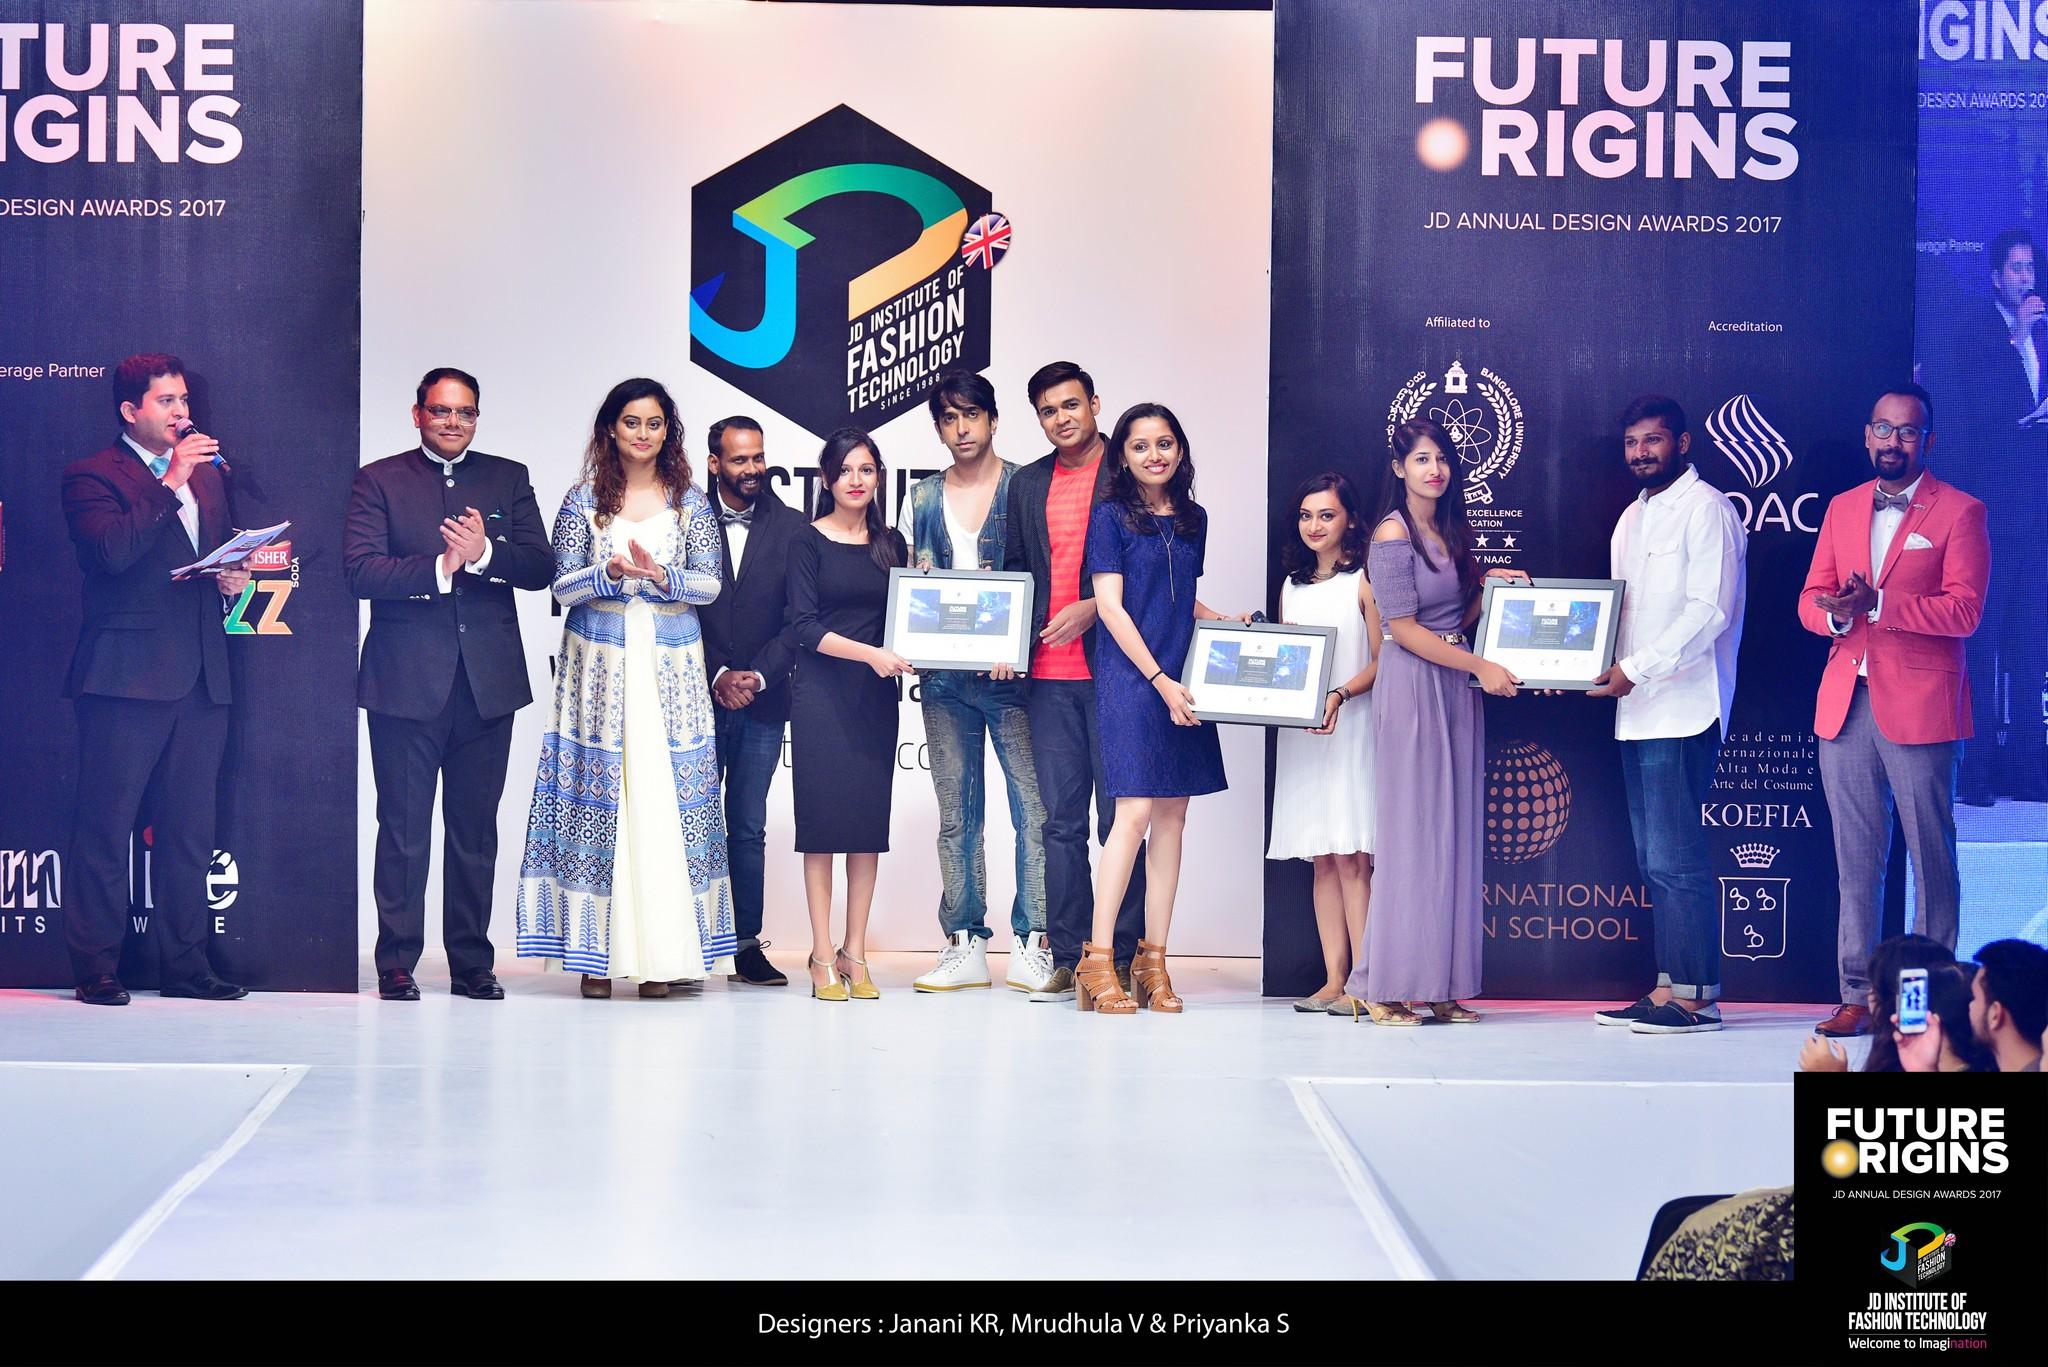 Stardust - Future Origin - JD Annual Design Awards 2017 | Photography : Jerin Nath stardust - future origin - jd annual design awards 2017 Stardust – Future Origin – JD Annual Design Awards 2017 Stardust Future Origin JD Annual Design Awards 2017 5